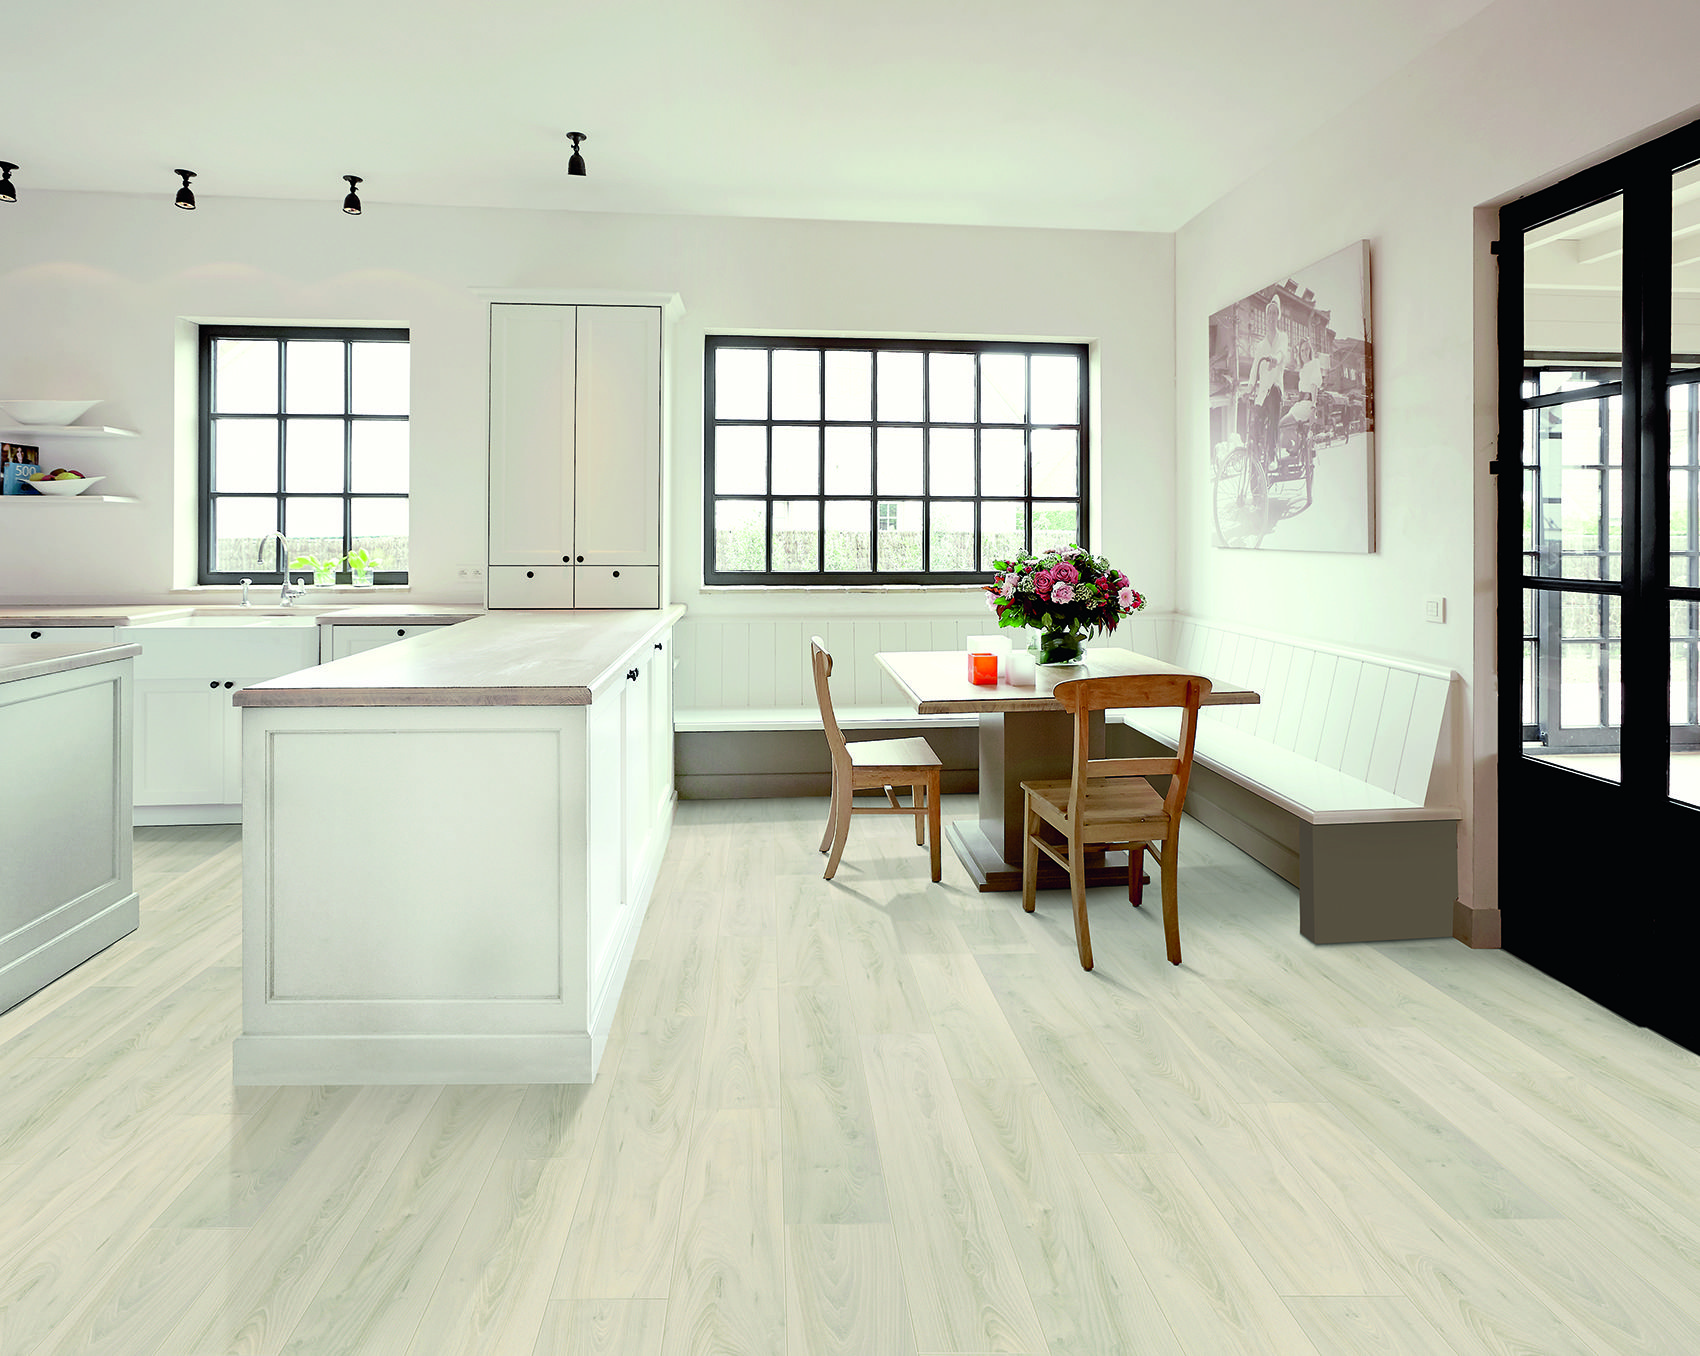 Vloer keuken vloer inspiratie laminaat eetkamer laminaat eiken